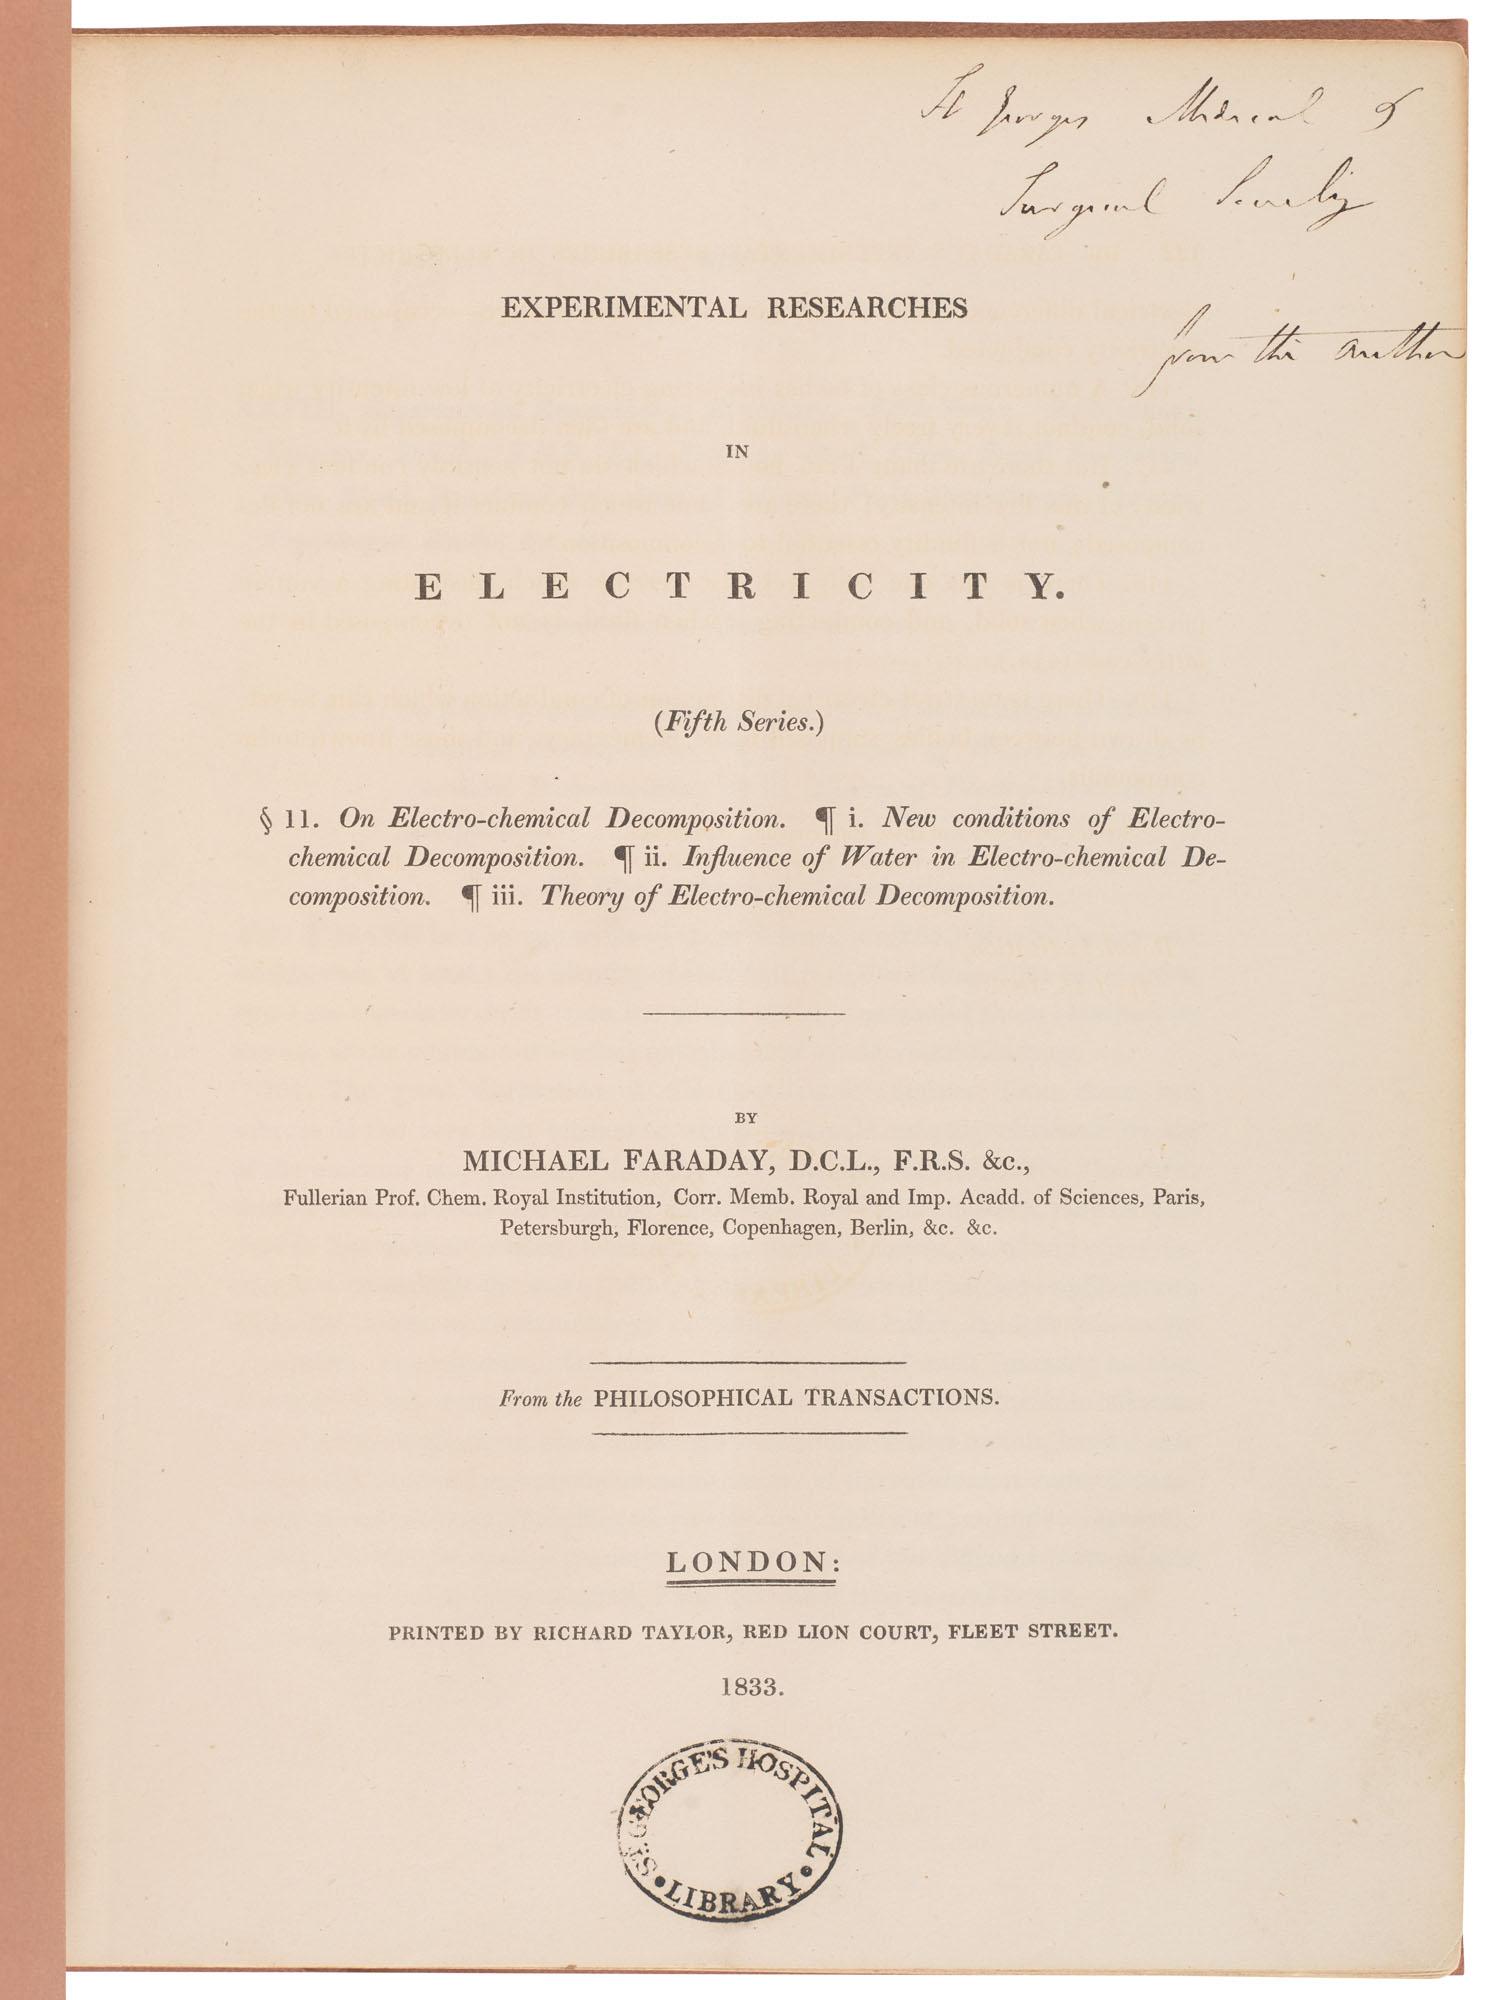 Michael Faraday (1792-1867)